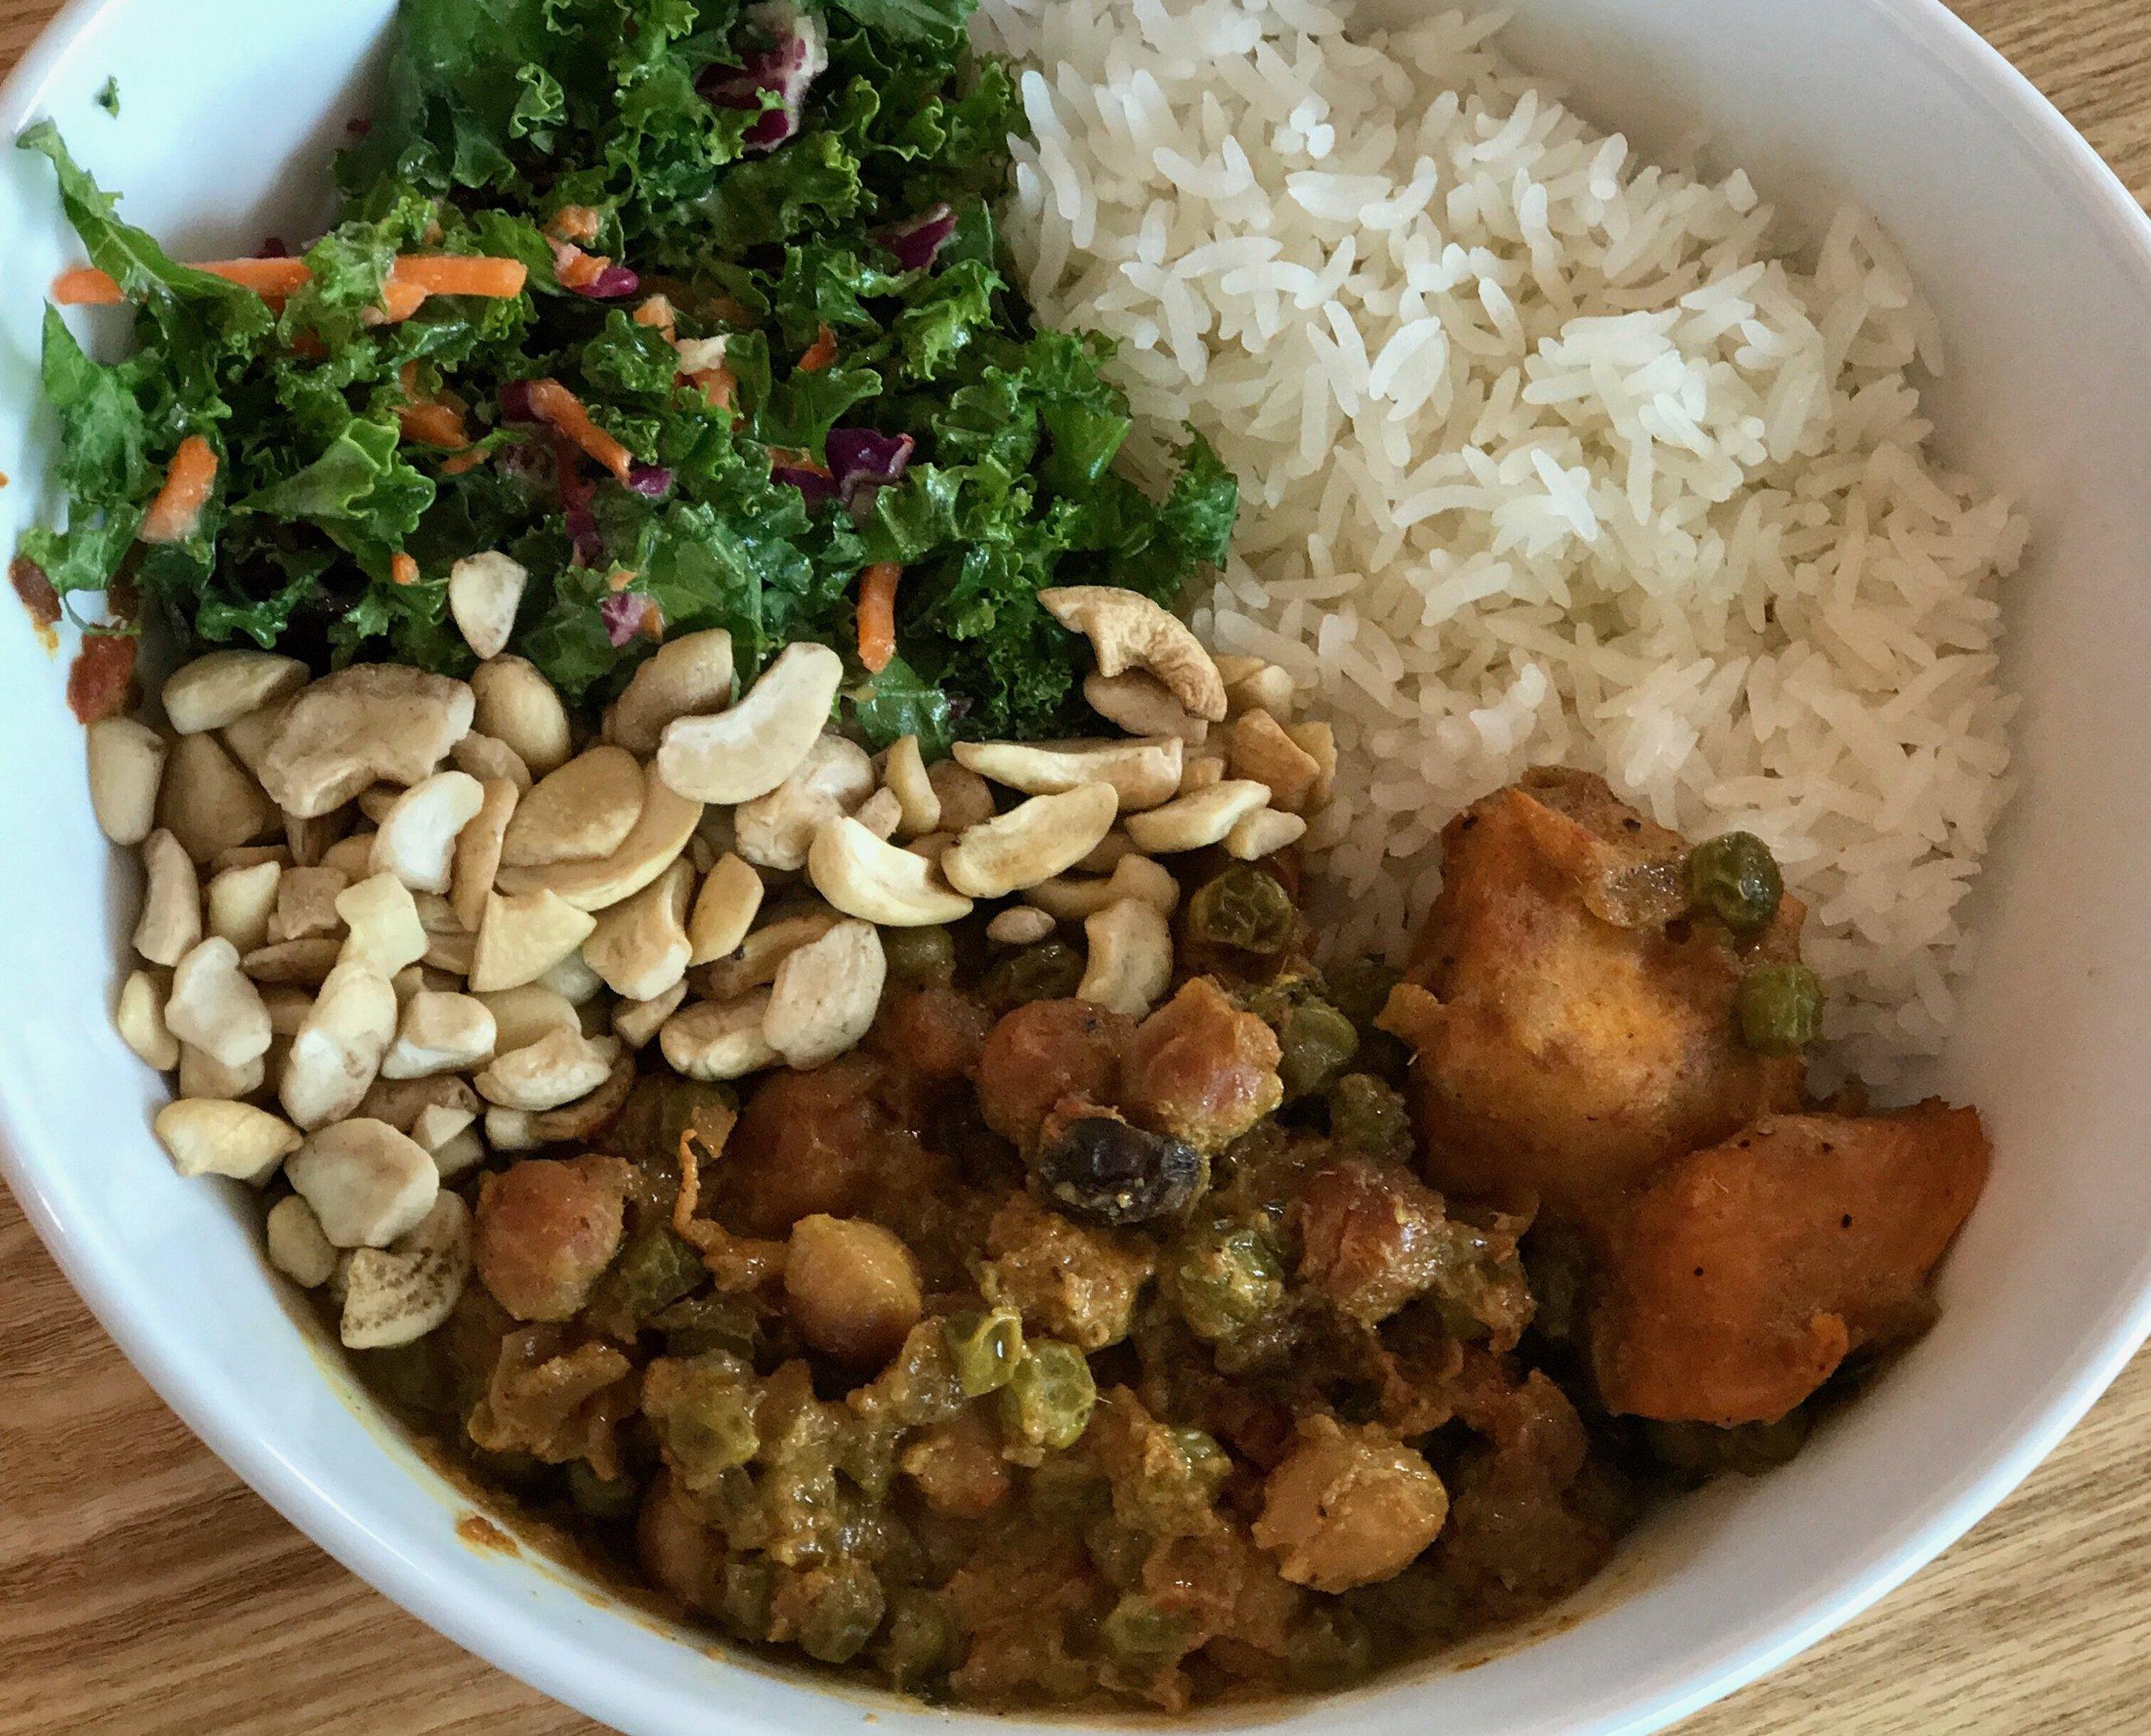 Surprise, surprise...it's 100% VEGAN. Sweet potato, garbanzo beans, green peas, kale salad, cashews, and jasmine rice. Chef Mawa's personal favorite.